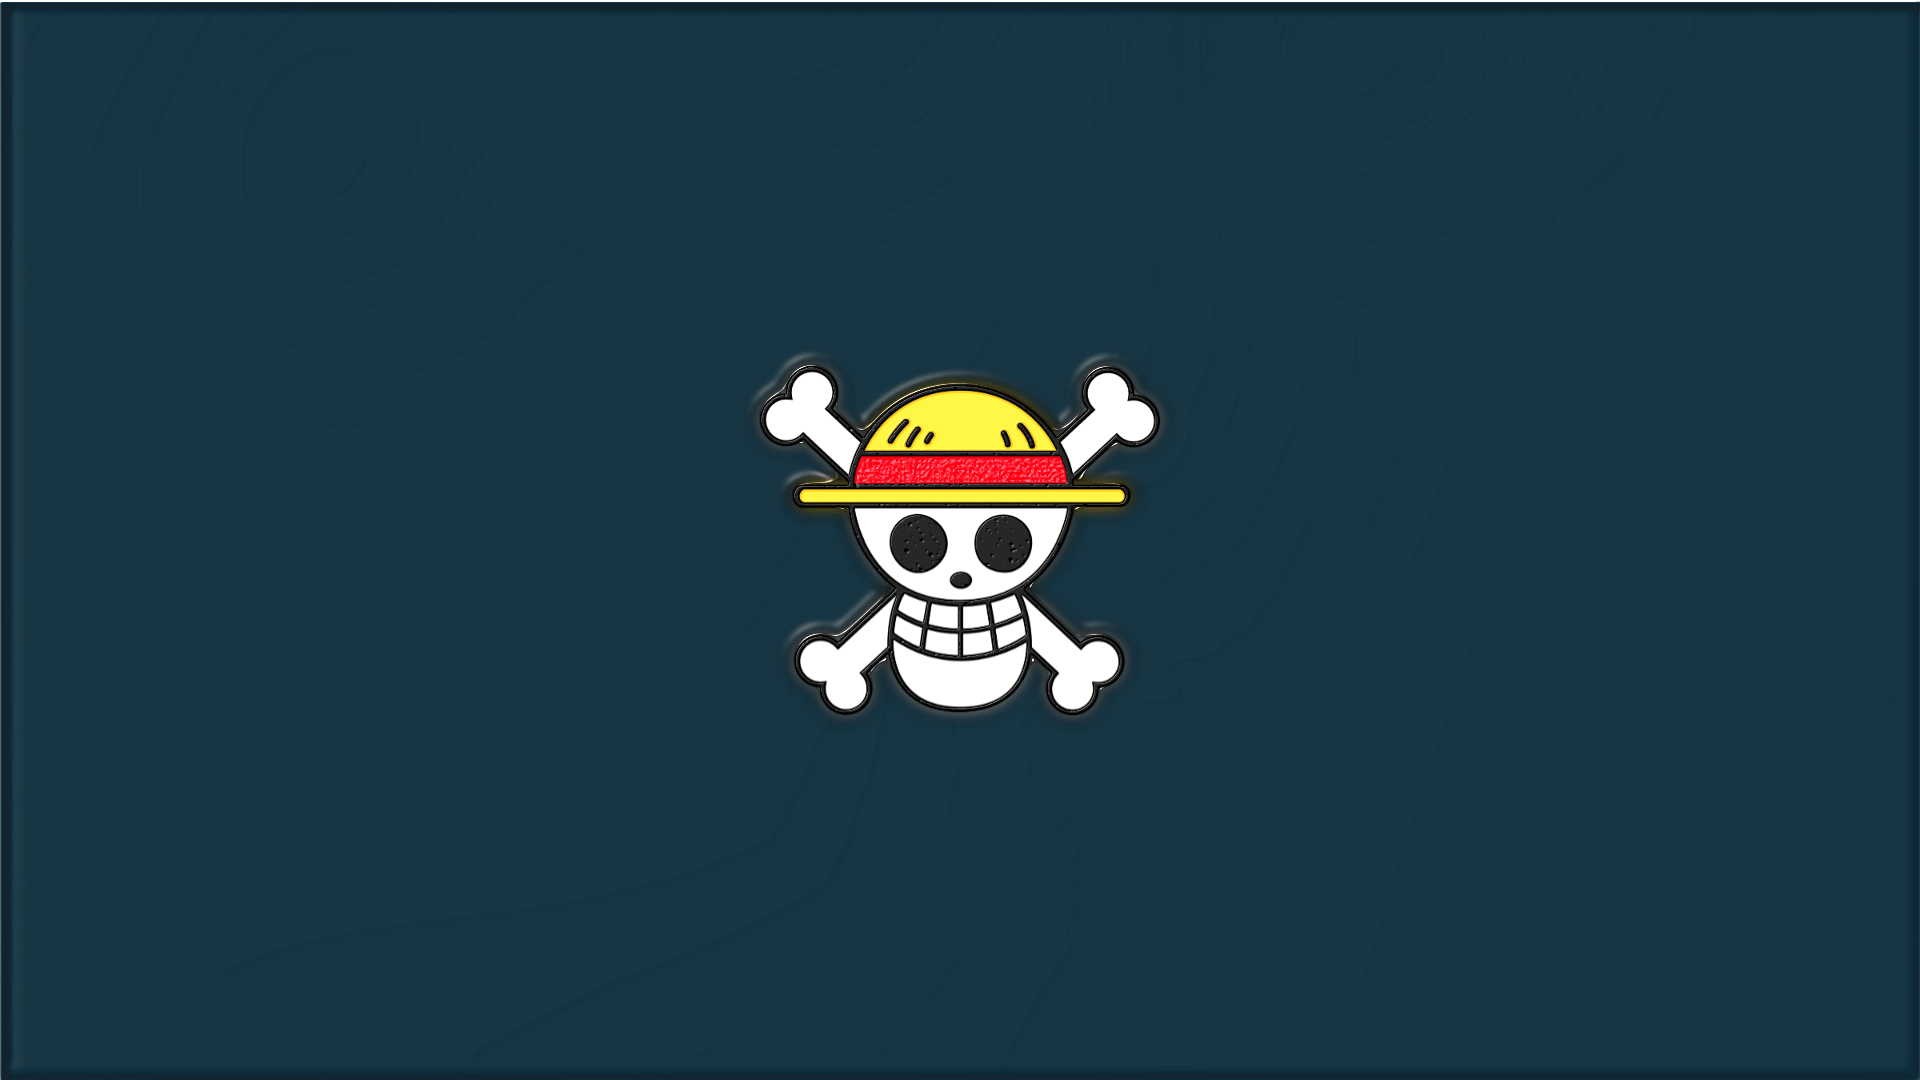 One Piece Wallpaper 1080p Skull 84926 Hd Wallpaper Backgrounds Download